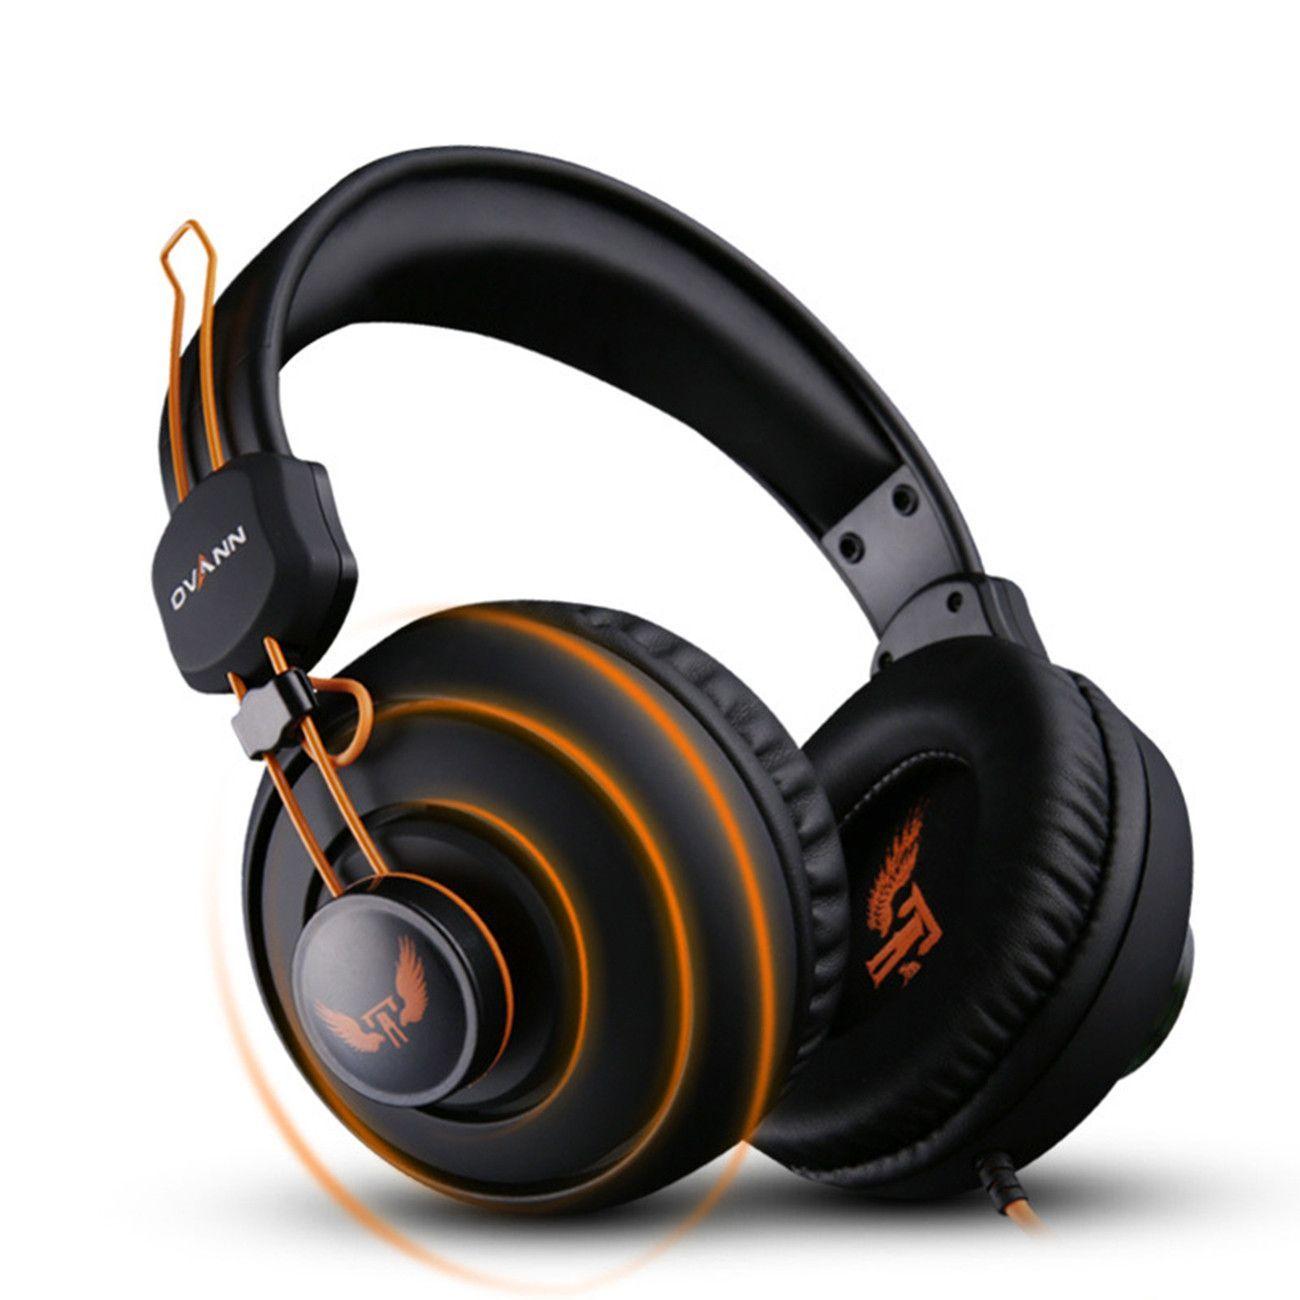 Ovann OVANNX7 3.5mm Stereo Headset Headphones Gaming